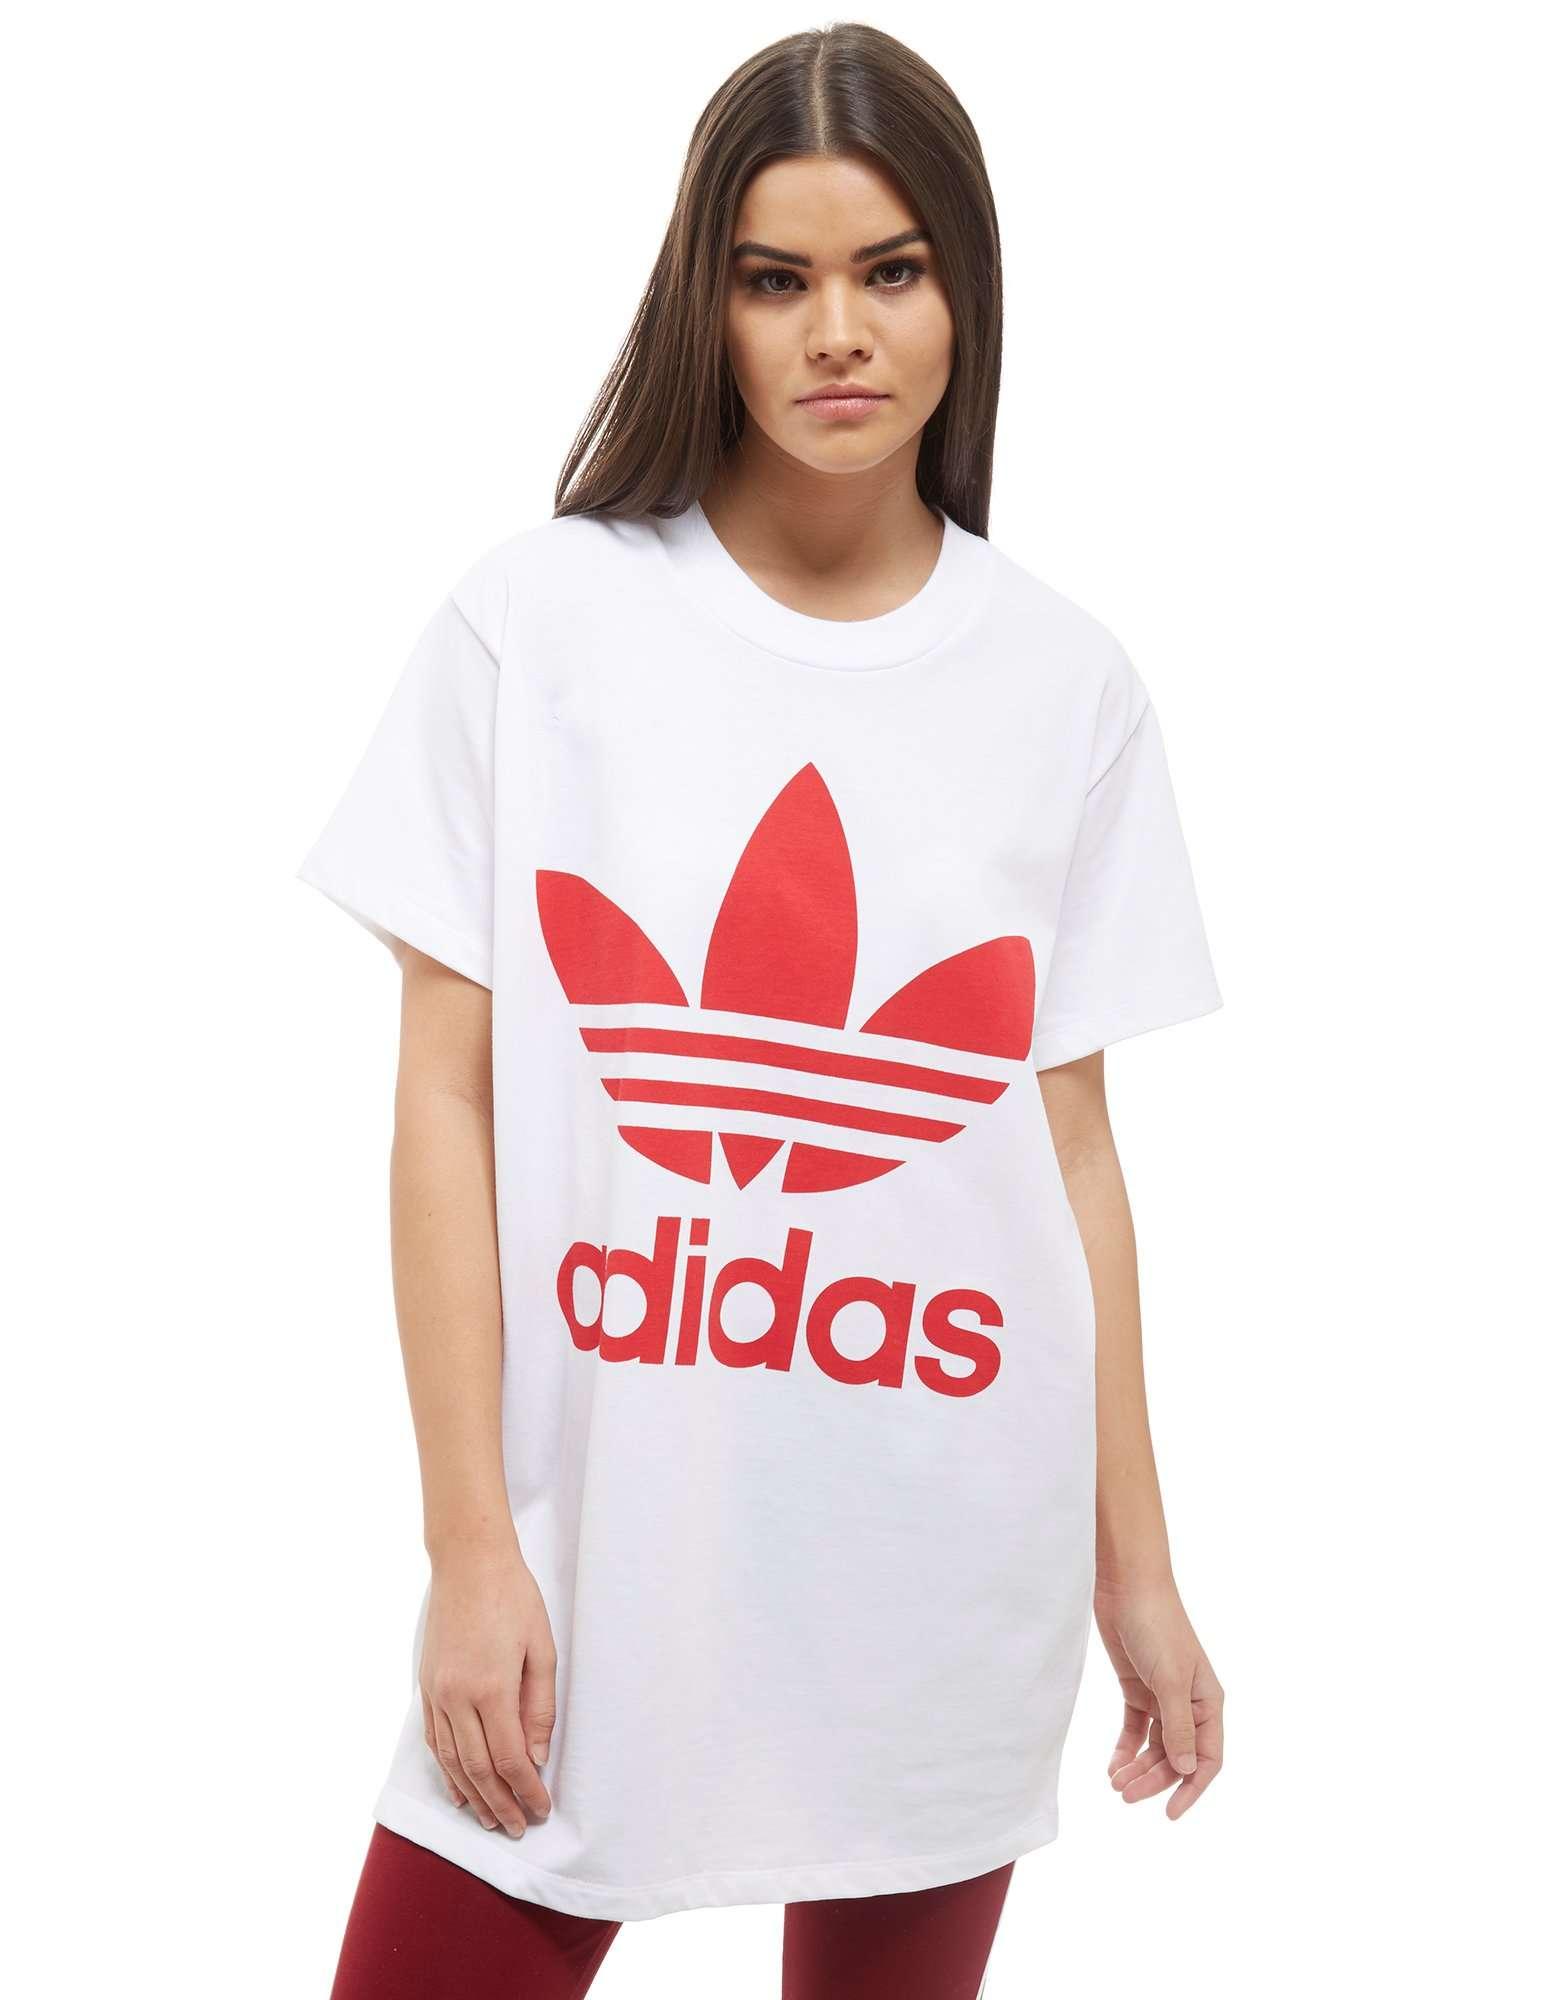 Adidas Gran Trifoglio Tee Tee Trifoglio Jd Sports c2a0d9